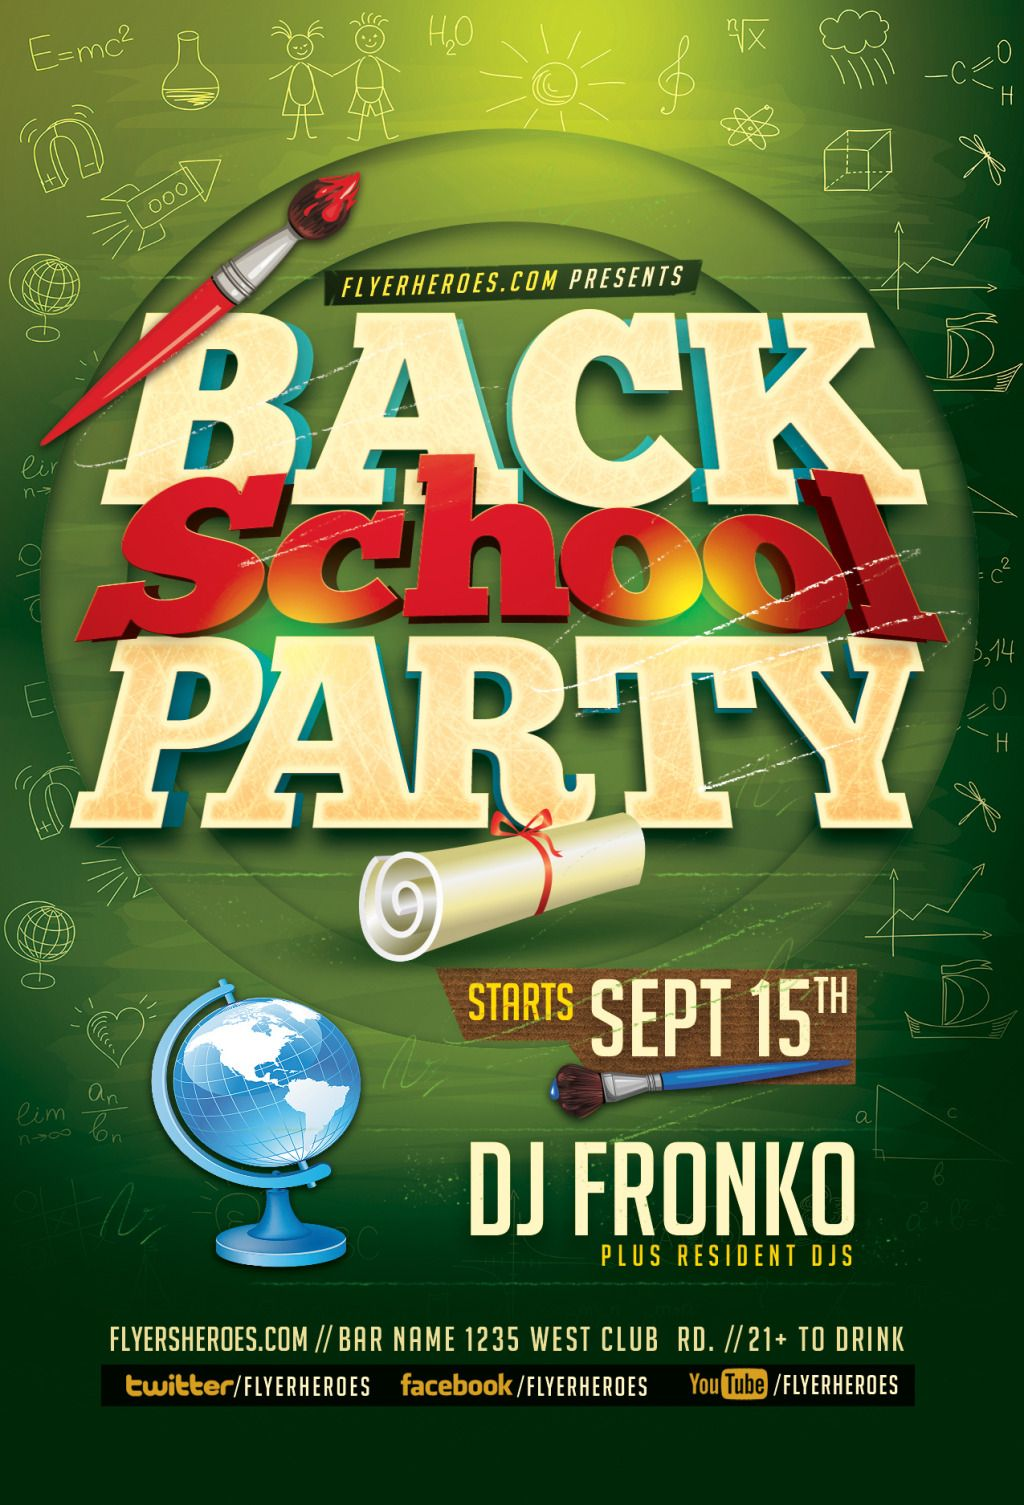 Back To School Party Leaflet Templates Download For Free On Heypik Com Heypik Backtoschool Stationery Blackboard September University College School